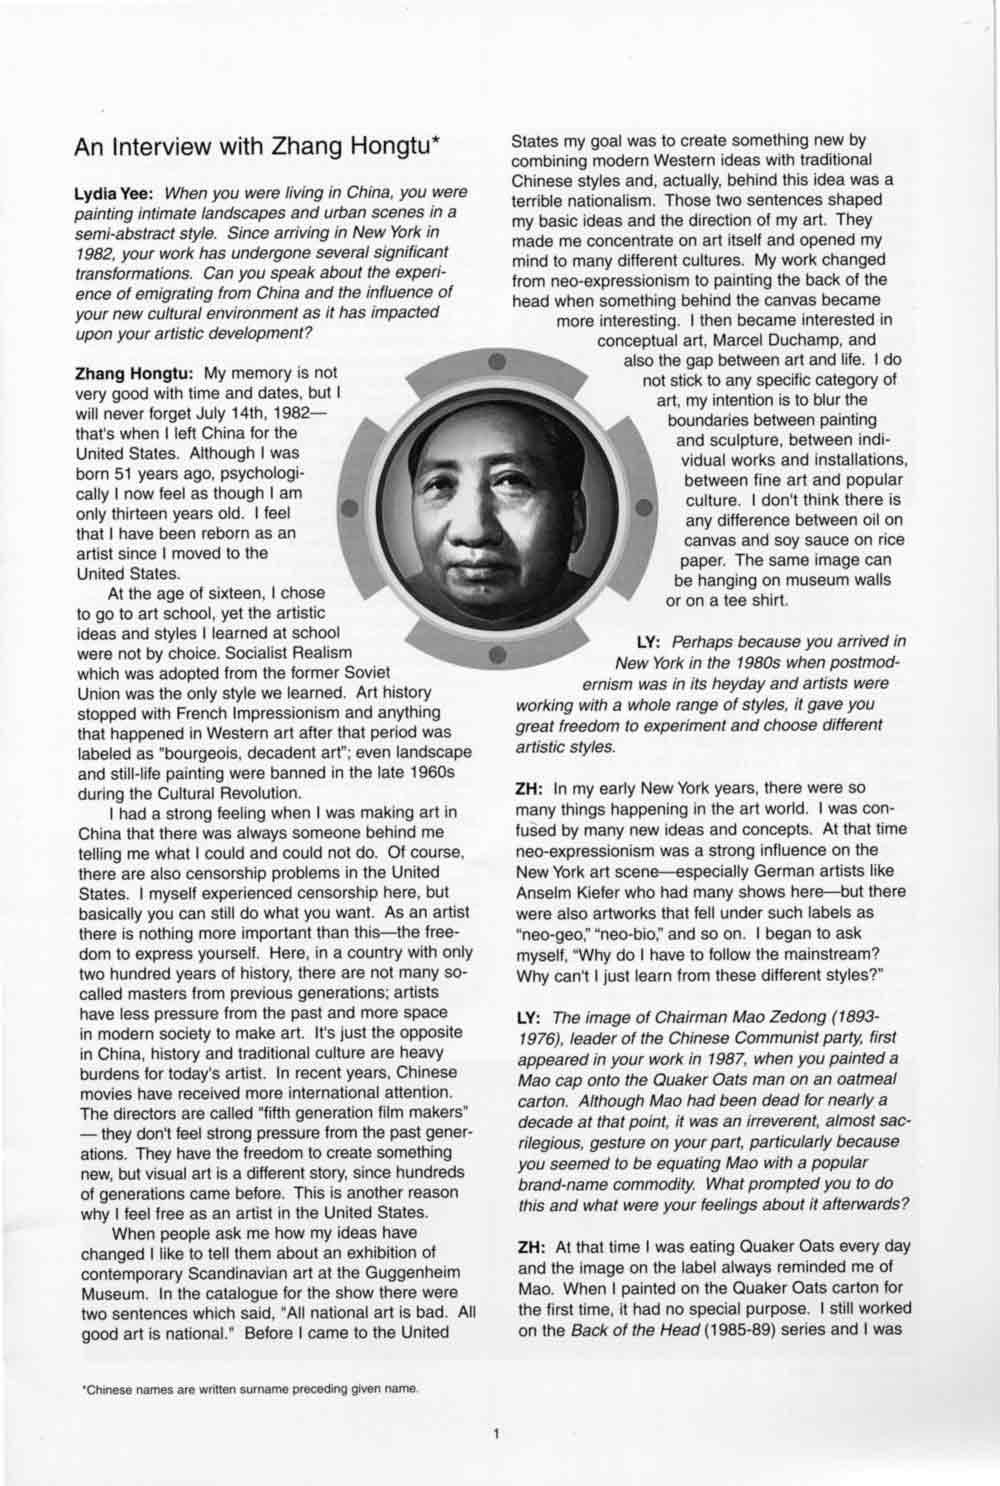 Material Mao, pg 2